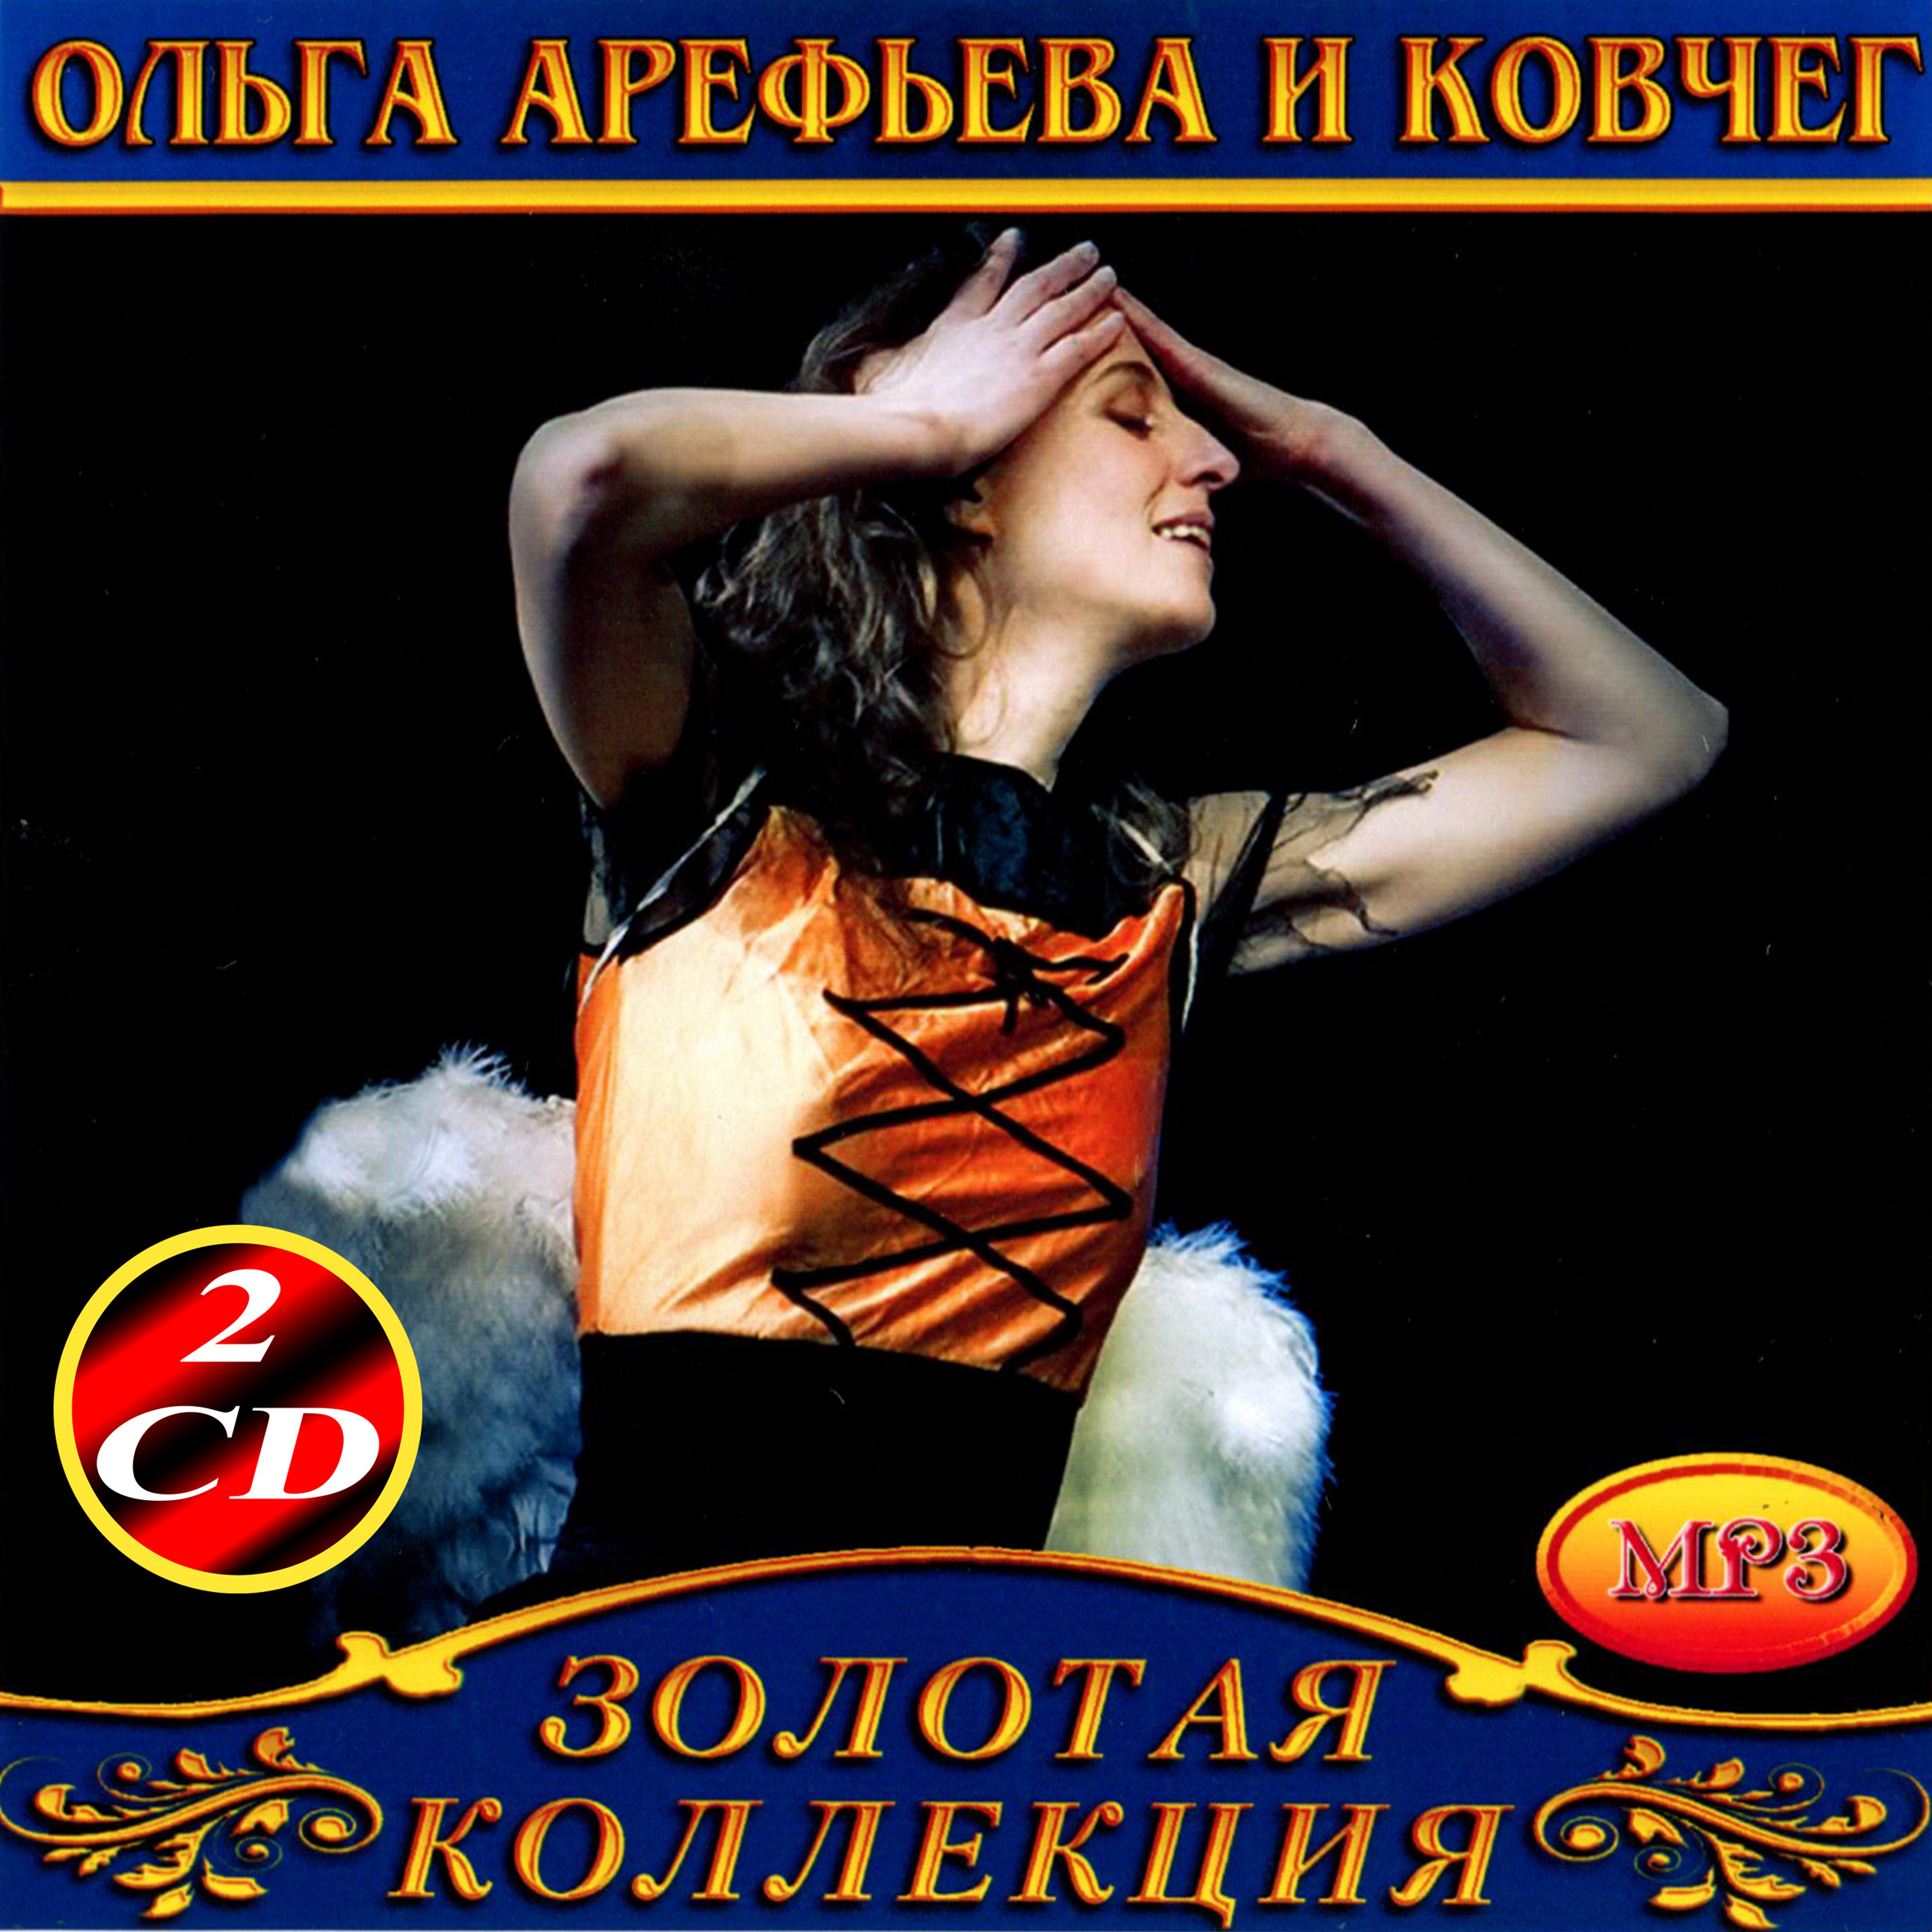 Ольга Арефьева & Ковчег 2cd [mp3]